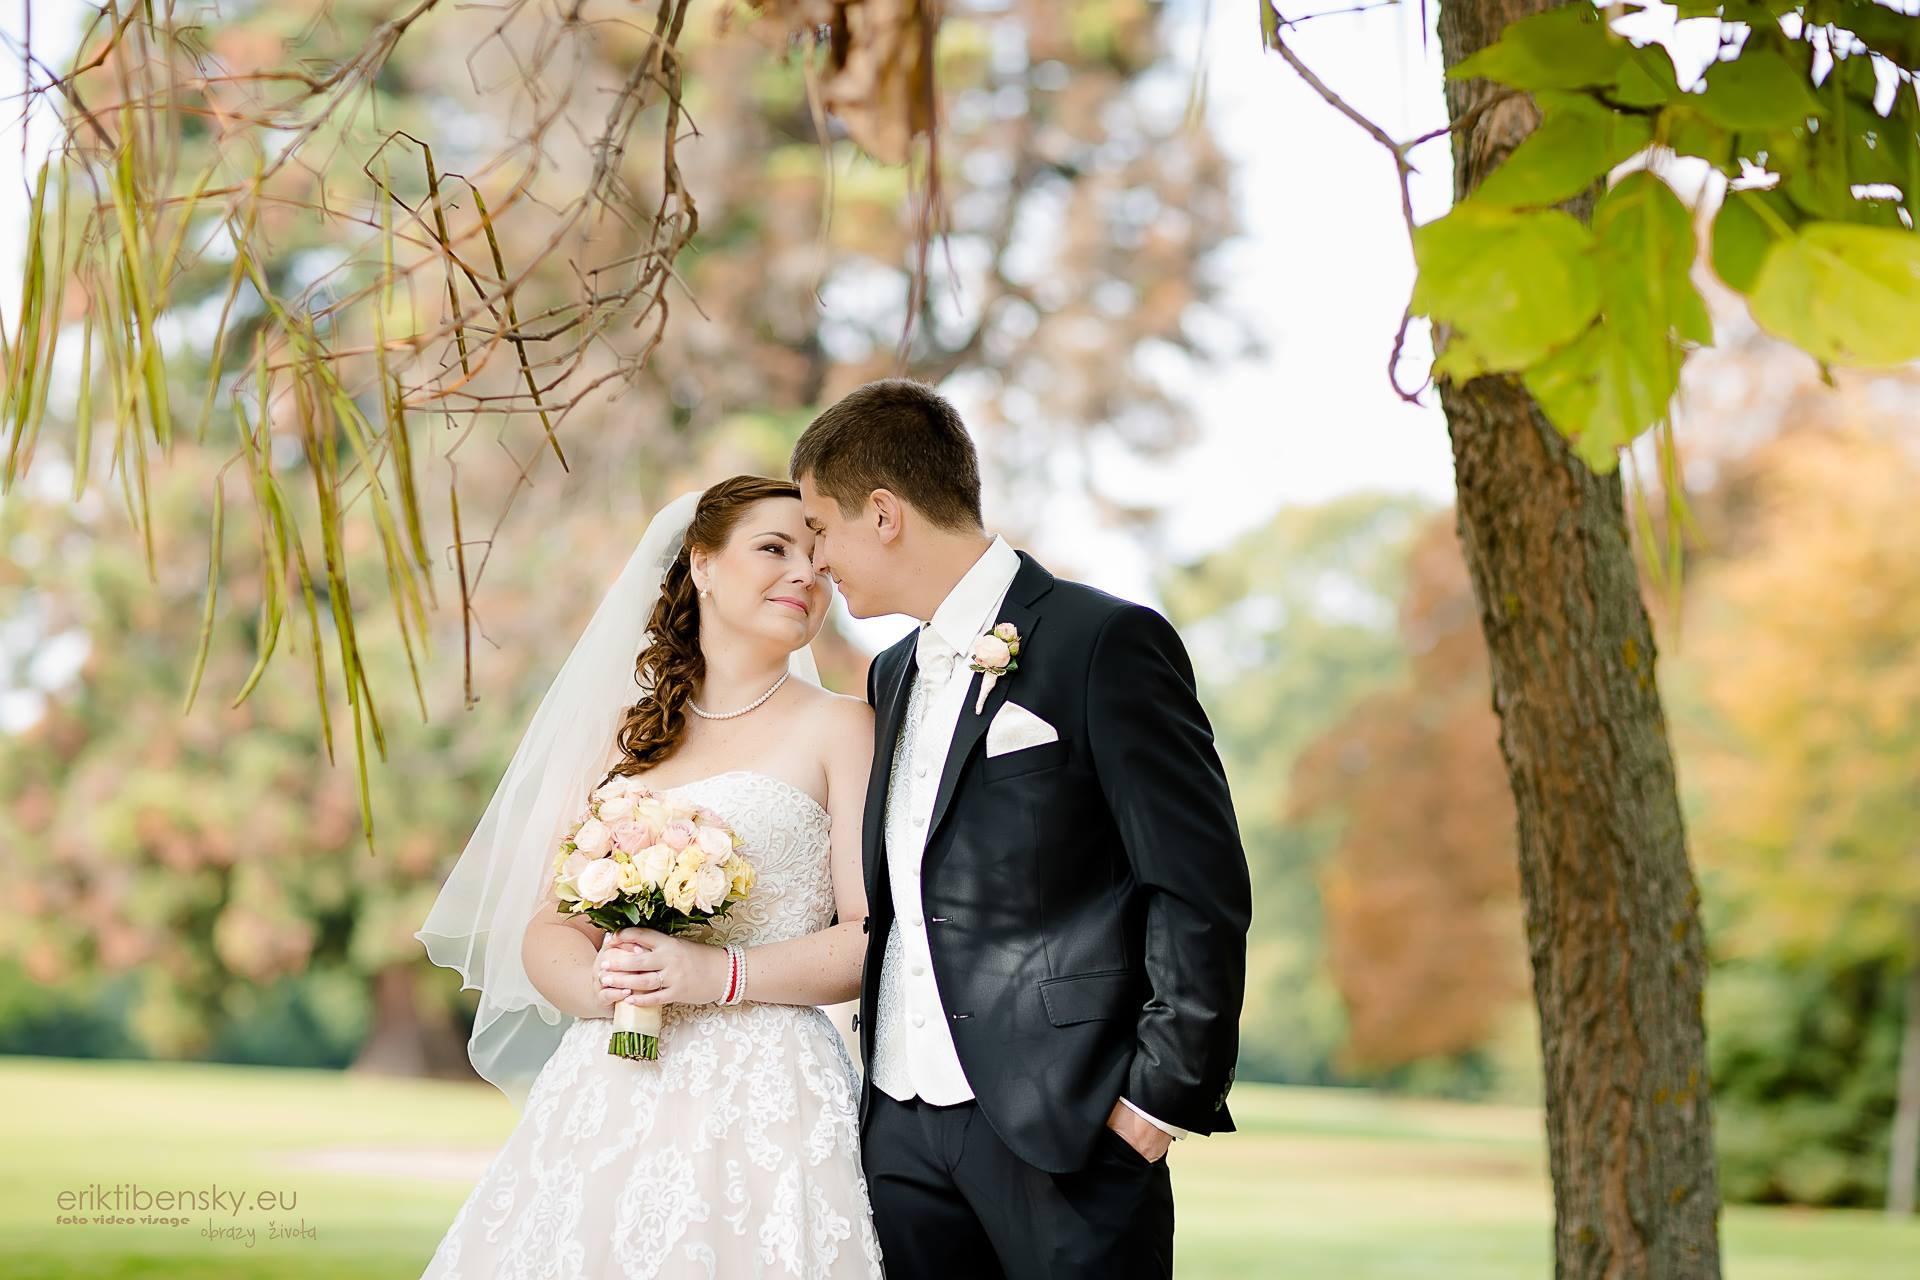 eriktibensky-eu-svadobny-fotograf-wedding-photographer-3081